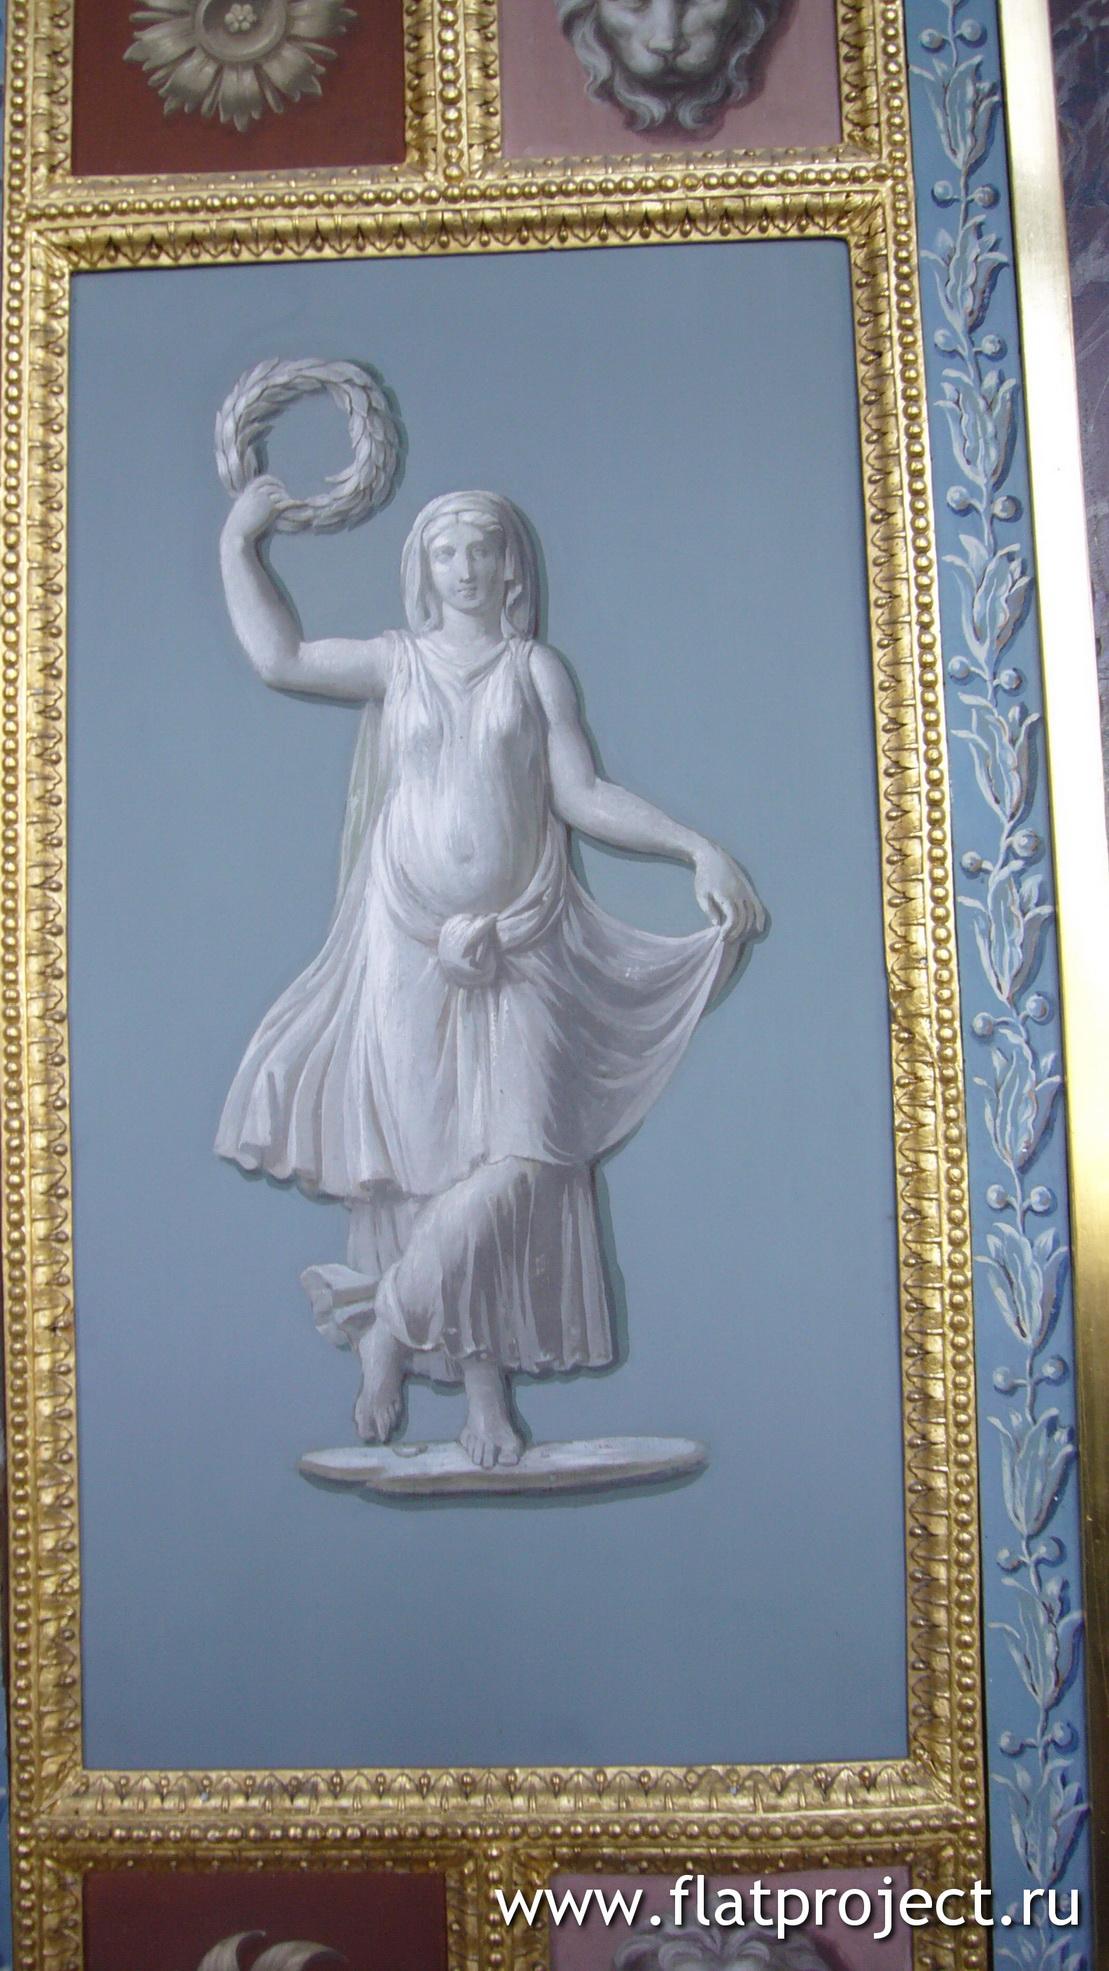 The State Hermitage museum interiors – photo 190